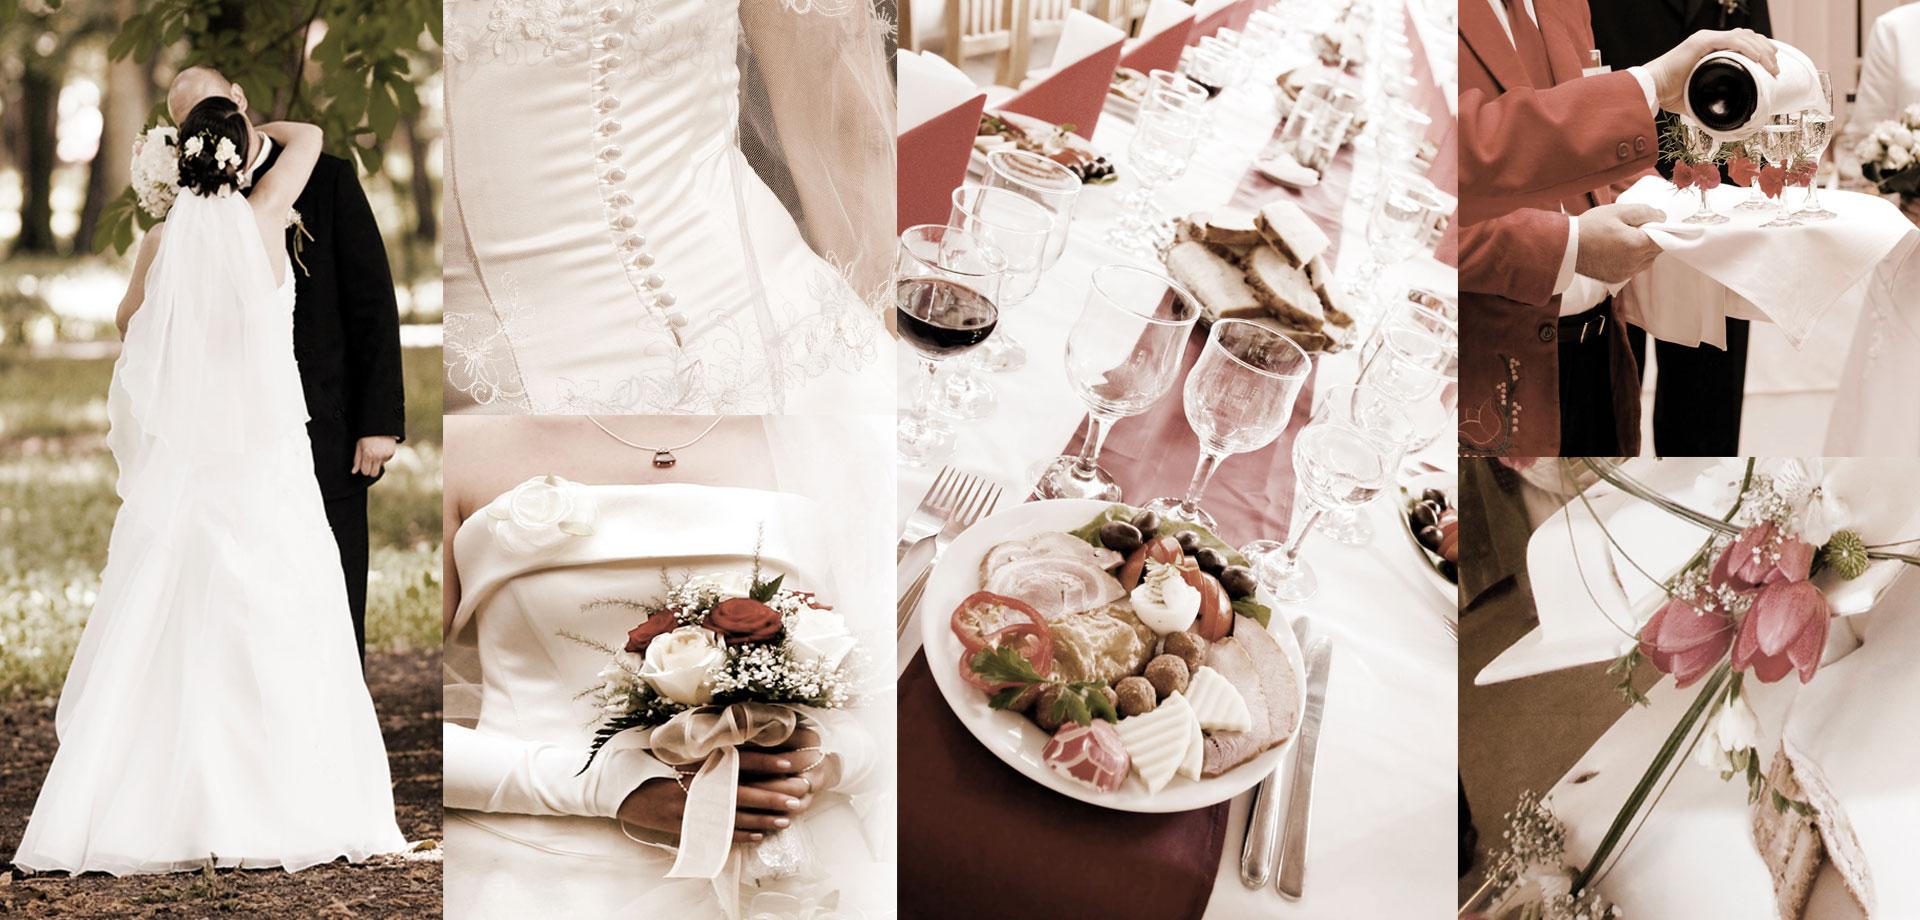 villa-selmi-ristorante-matrimoni-6